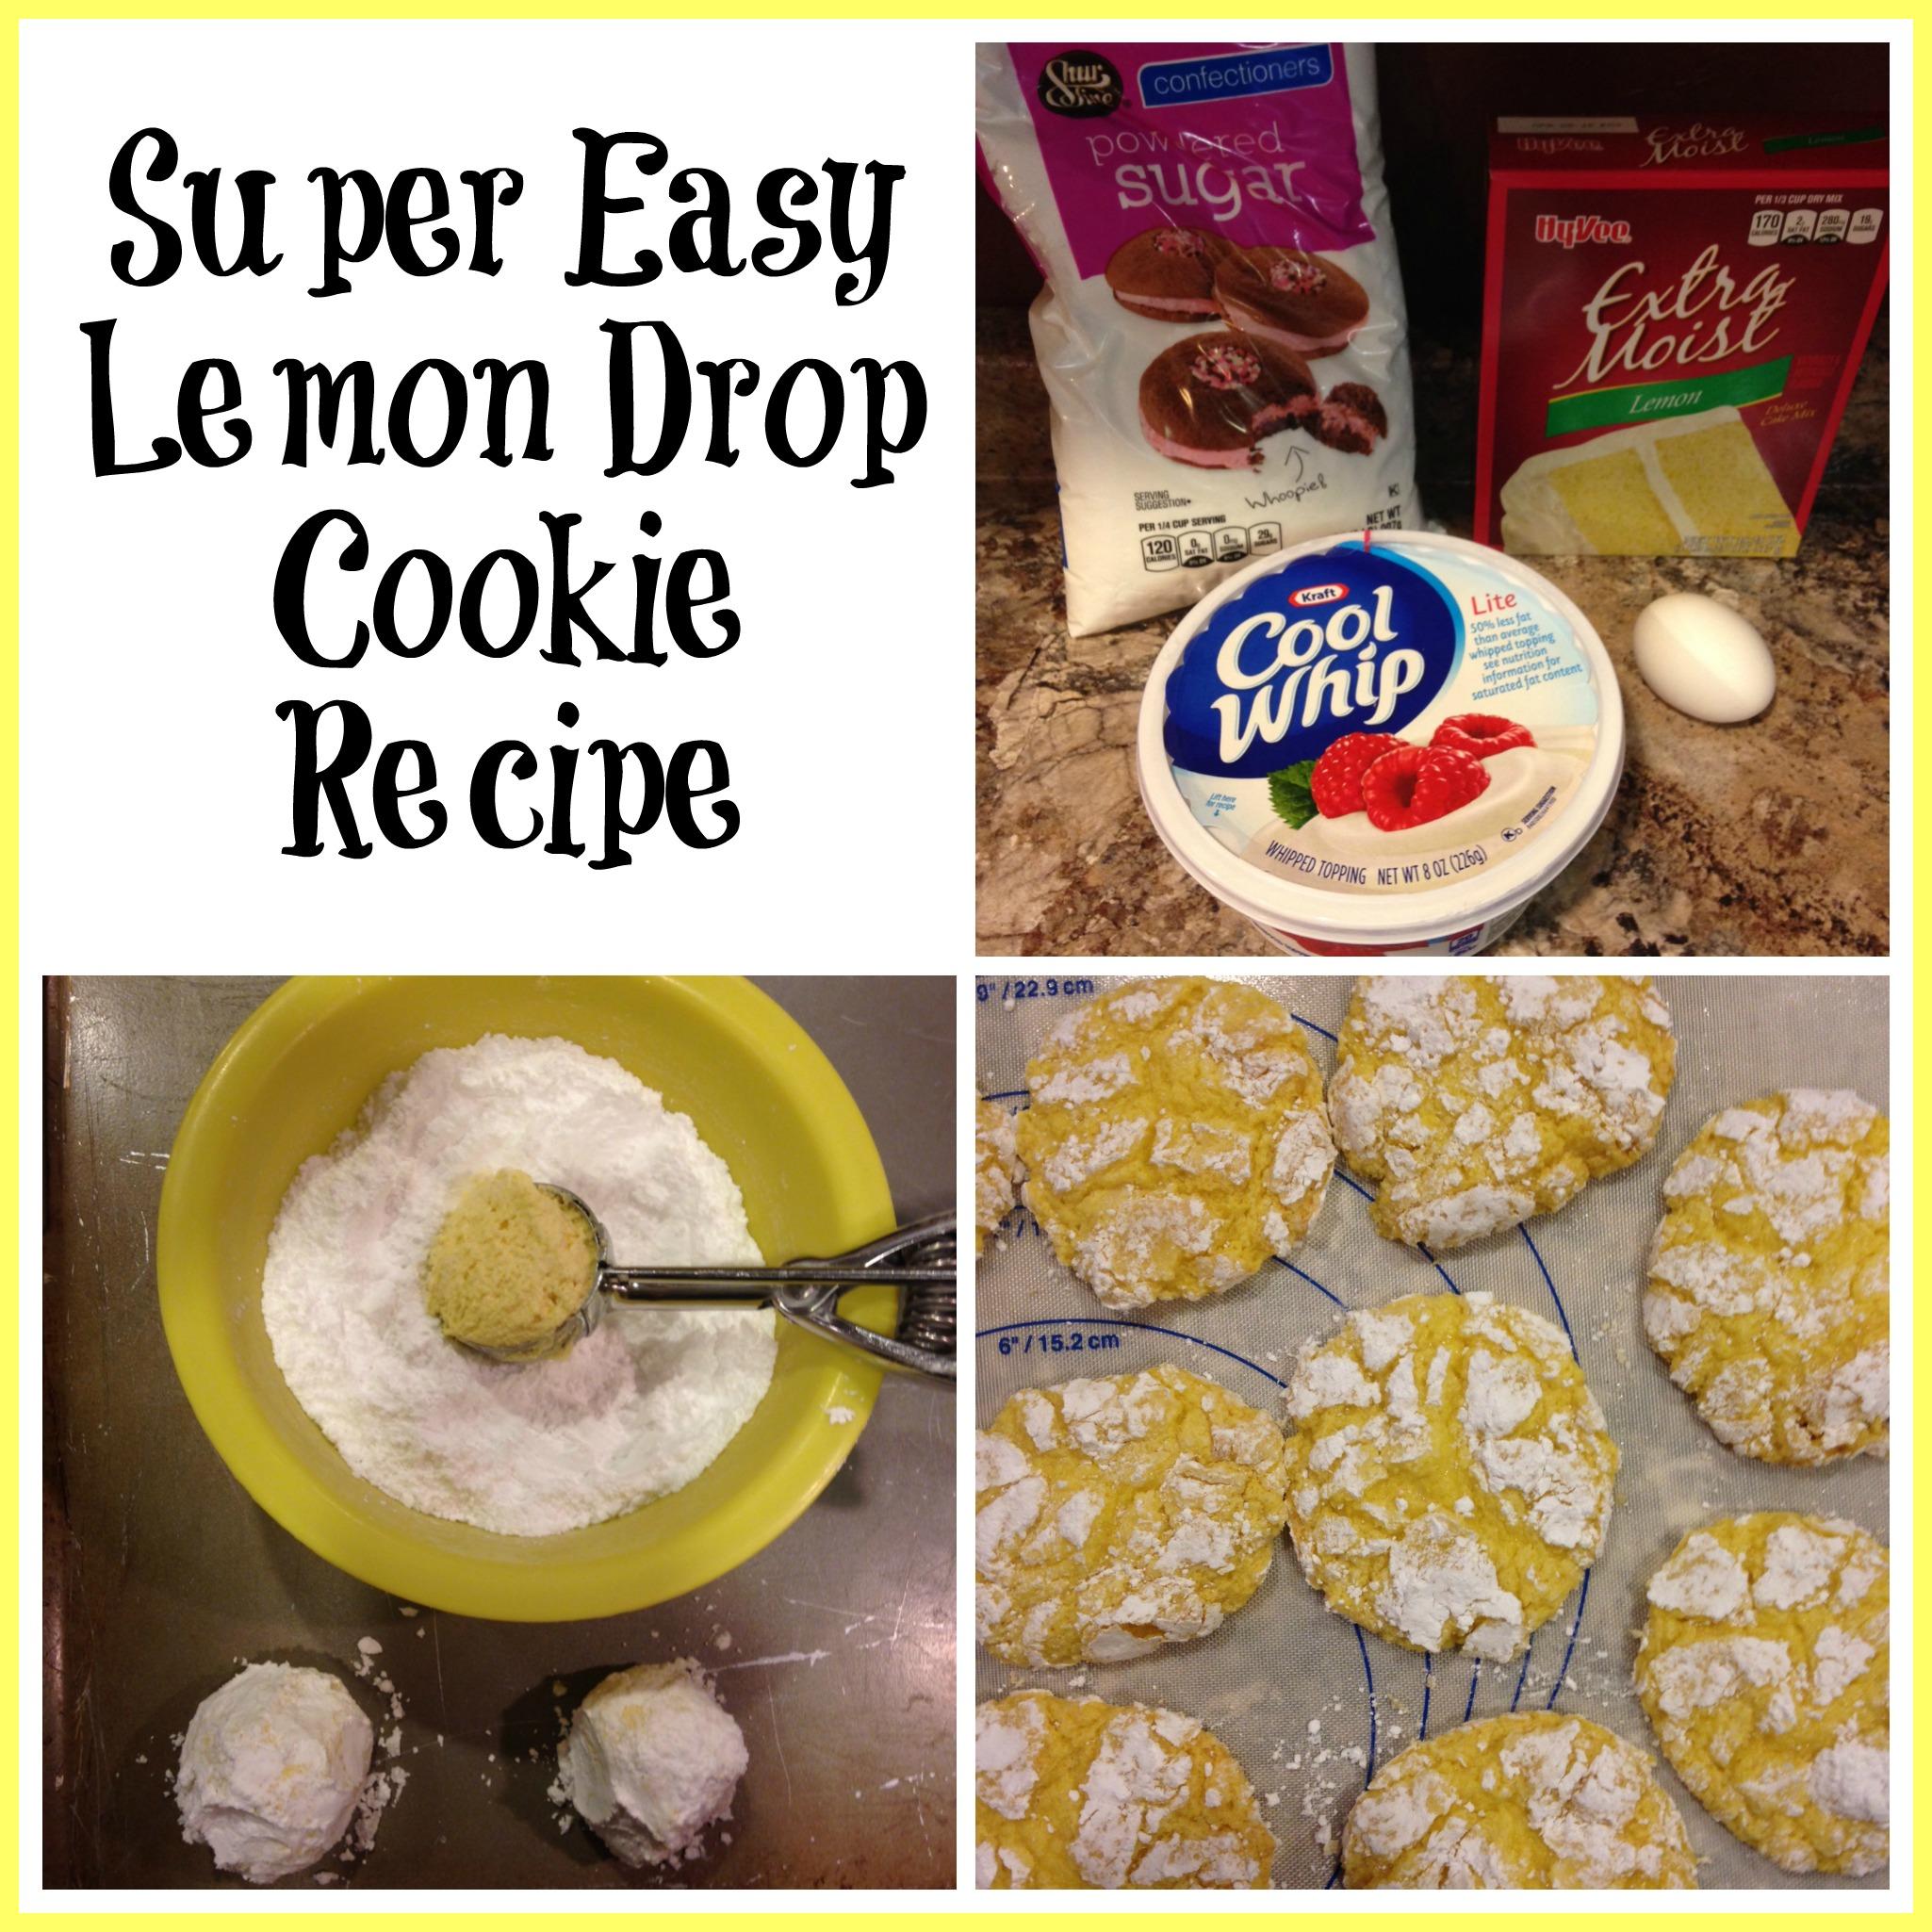 Super Easy Lemon Drop Cookie Recipe